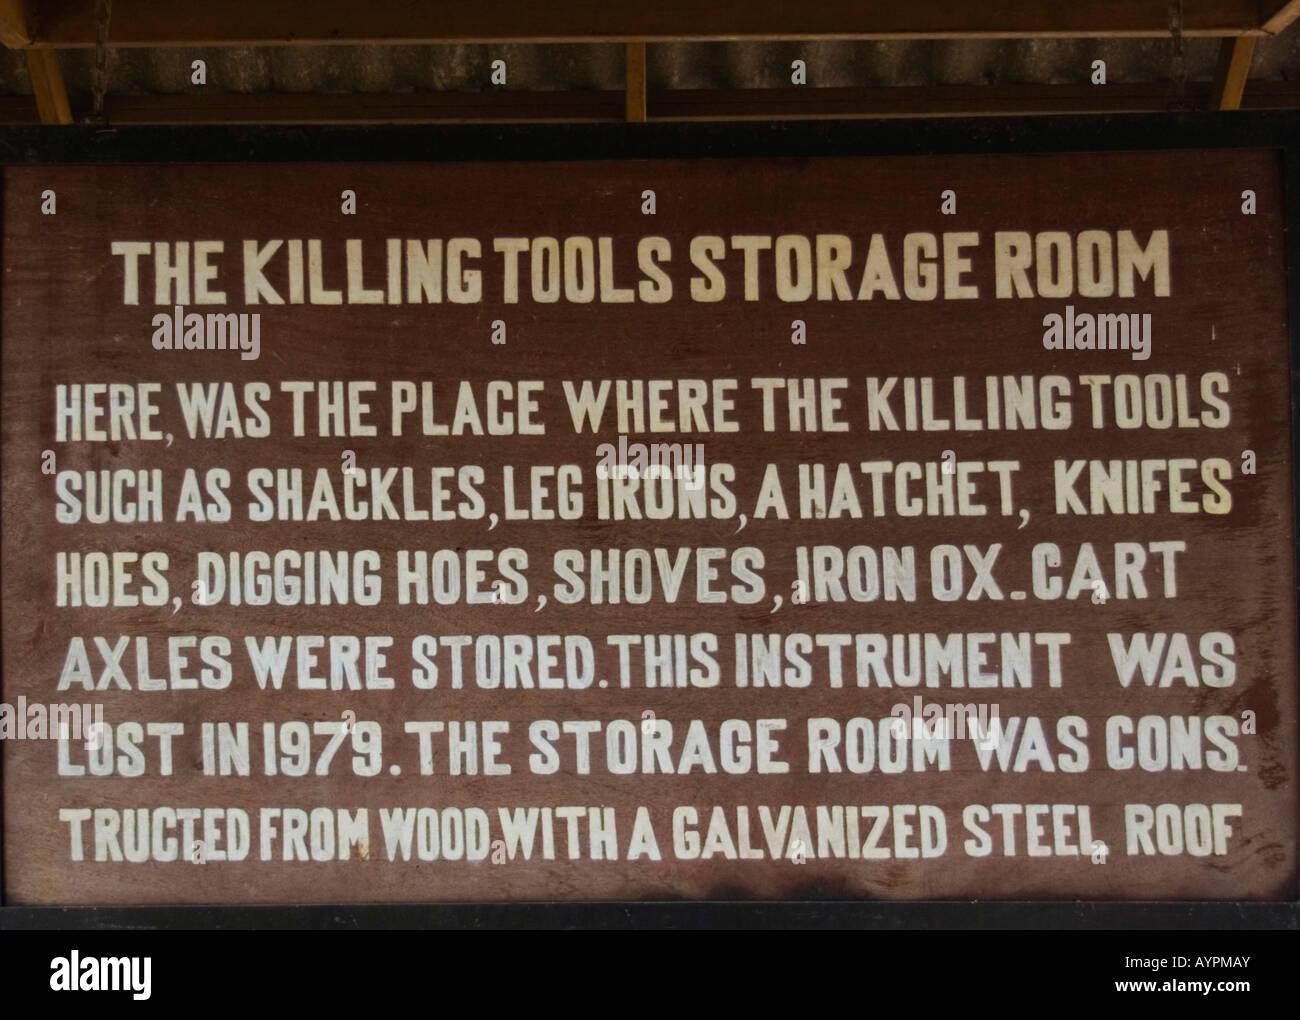 Plaque, beschreibt Gräueltaten der Roten Khmer während die Killing Fields-Ära, Phnom Penh, Kambodscha, Stockbild